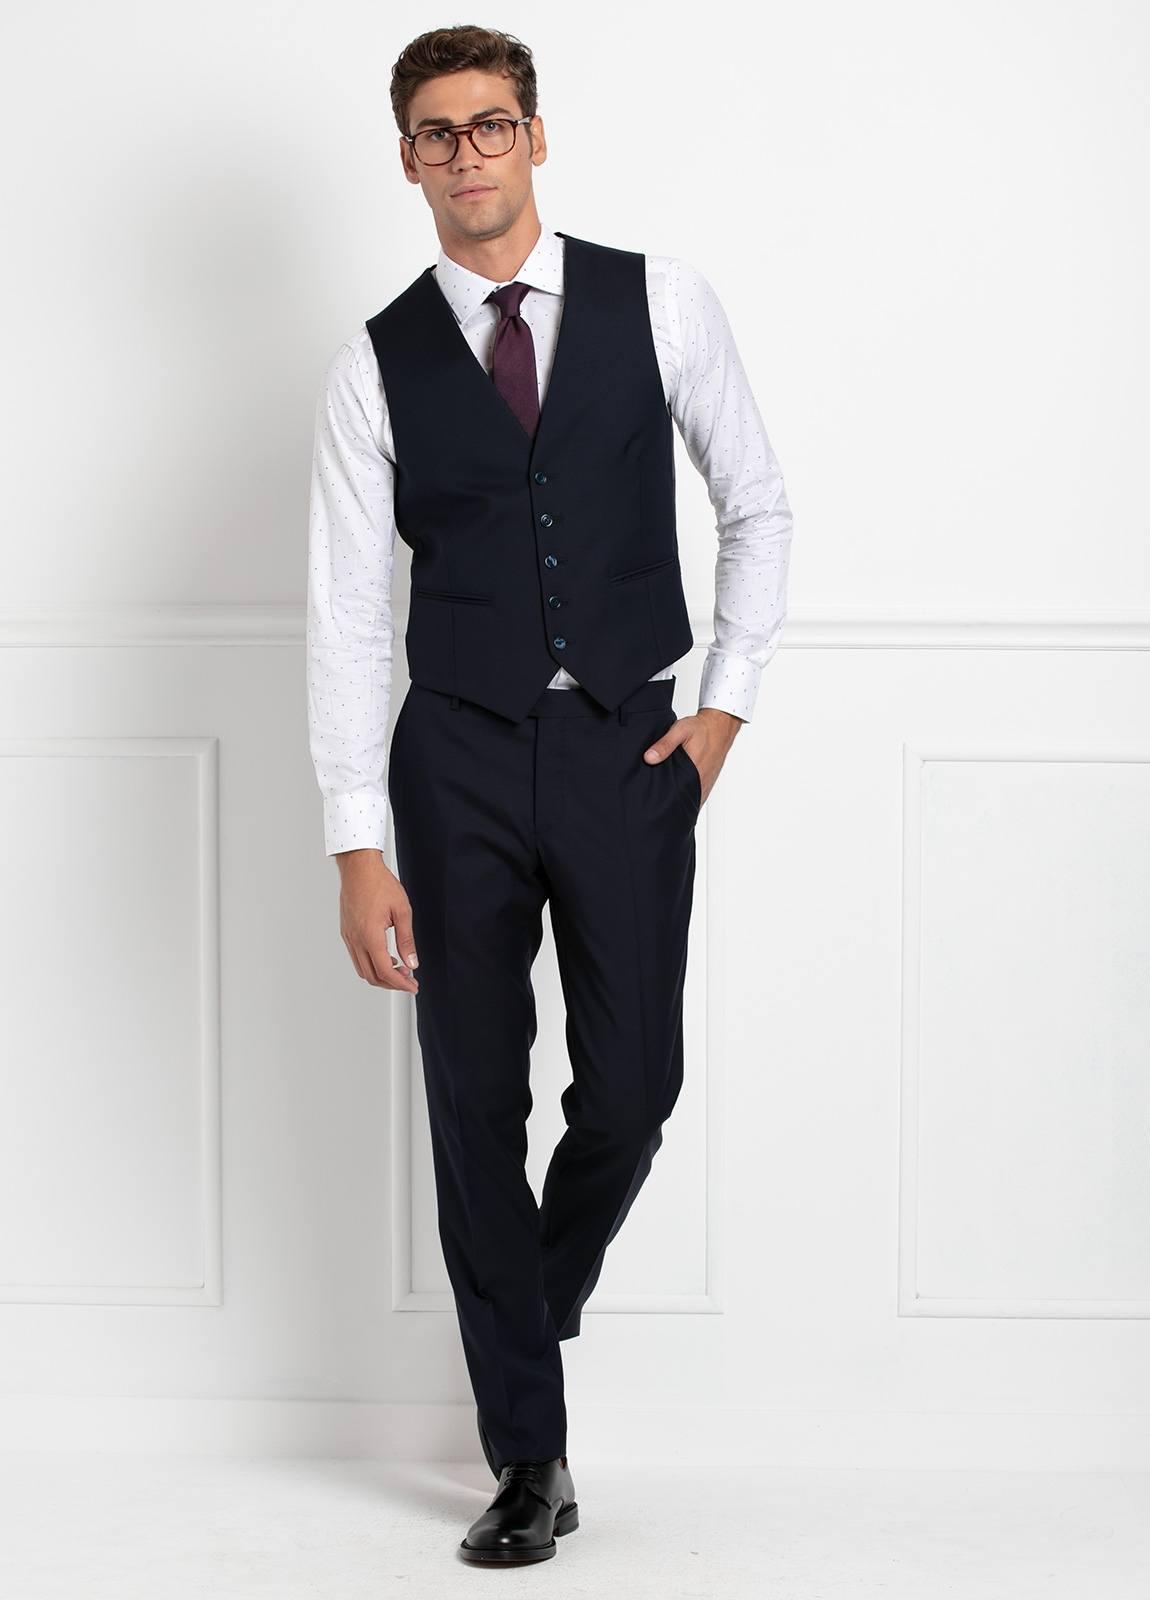 Traje liso SLIM FIT, tejido VBC con chaleco incluido, color azul marino, 100% Lana. - Ítem8